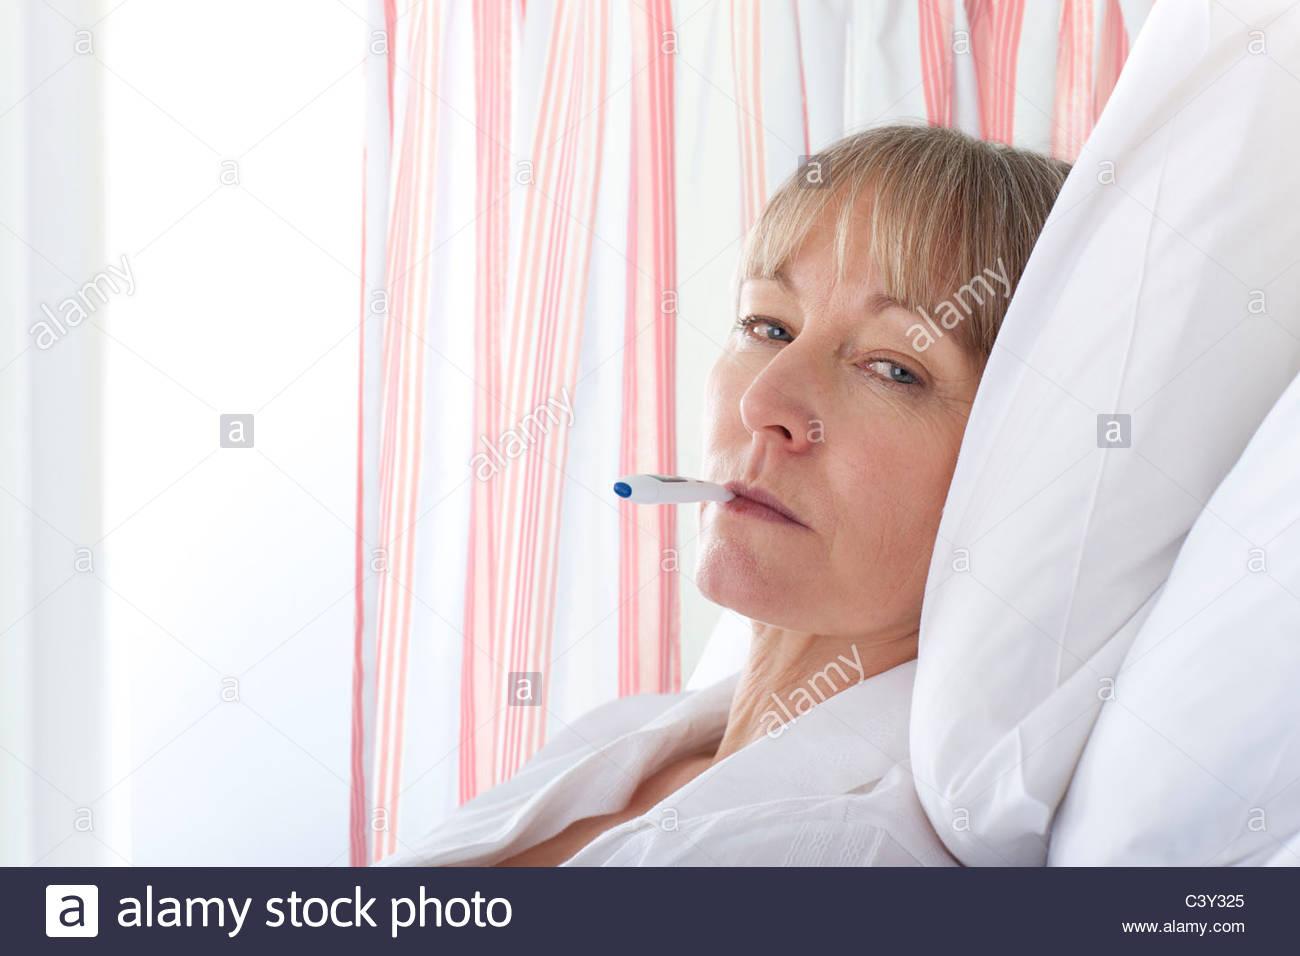 Patient having temperature taken in hospital room - Stock Image